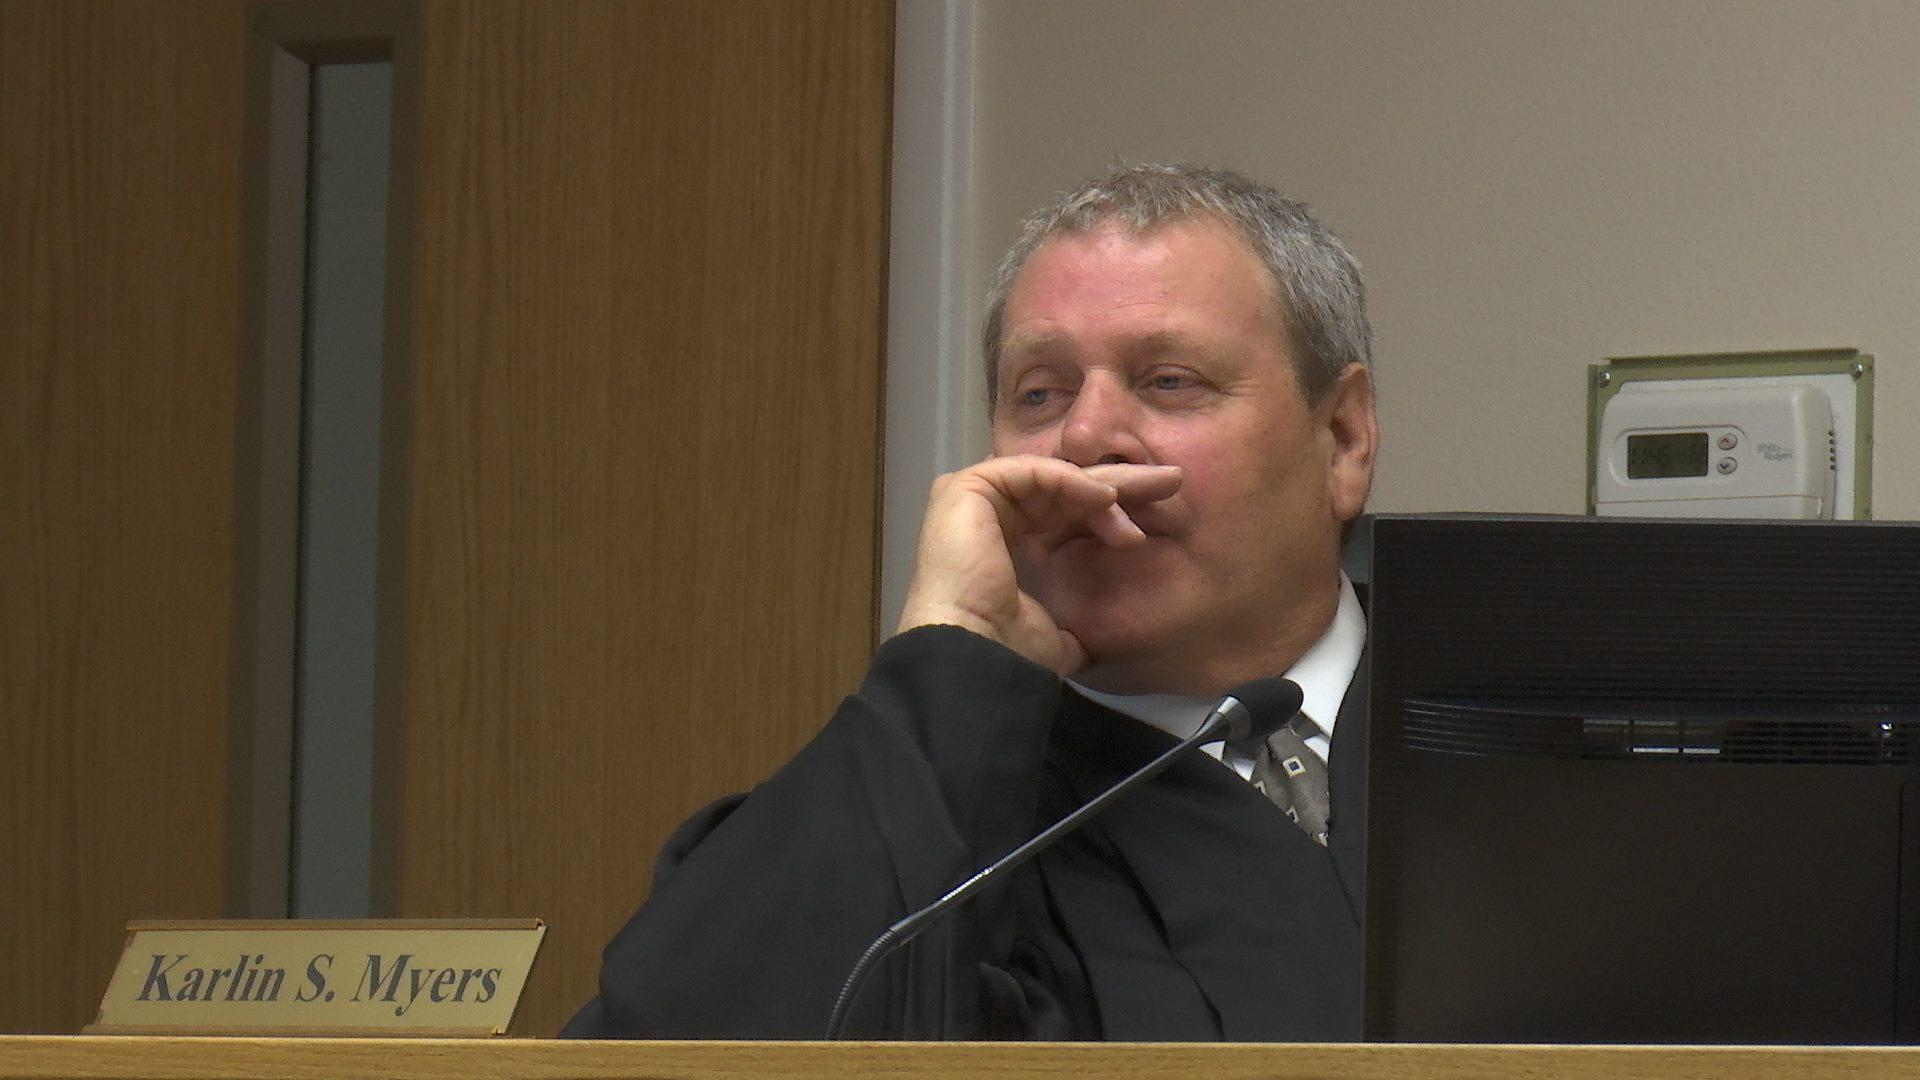 Judge Karlin Myers listens to testimony at Varlo Davenport's jury trial Wednesday, St. George, Utah, July 13, 2016   Photo by Sheldon Demke, St. George News